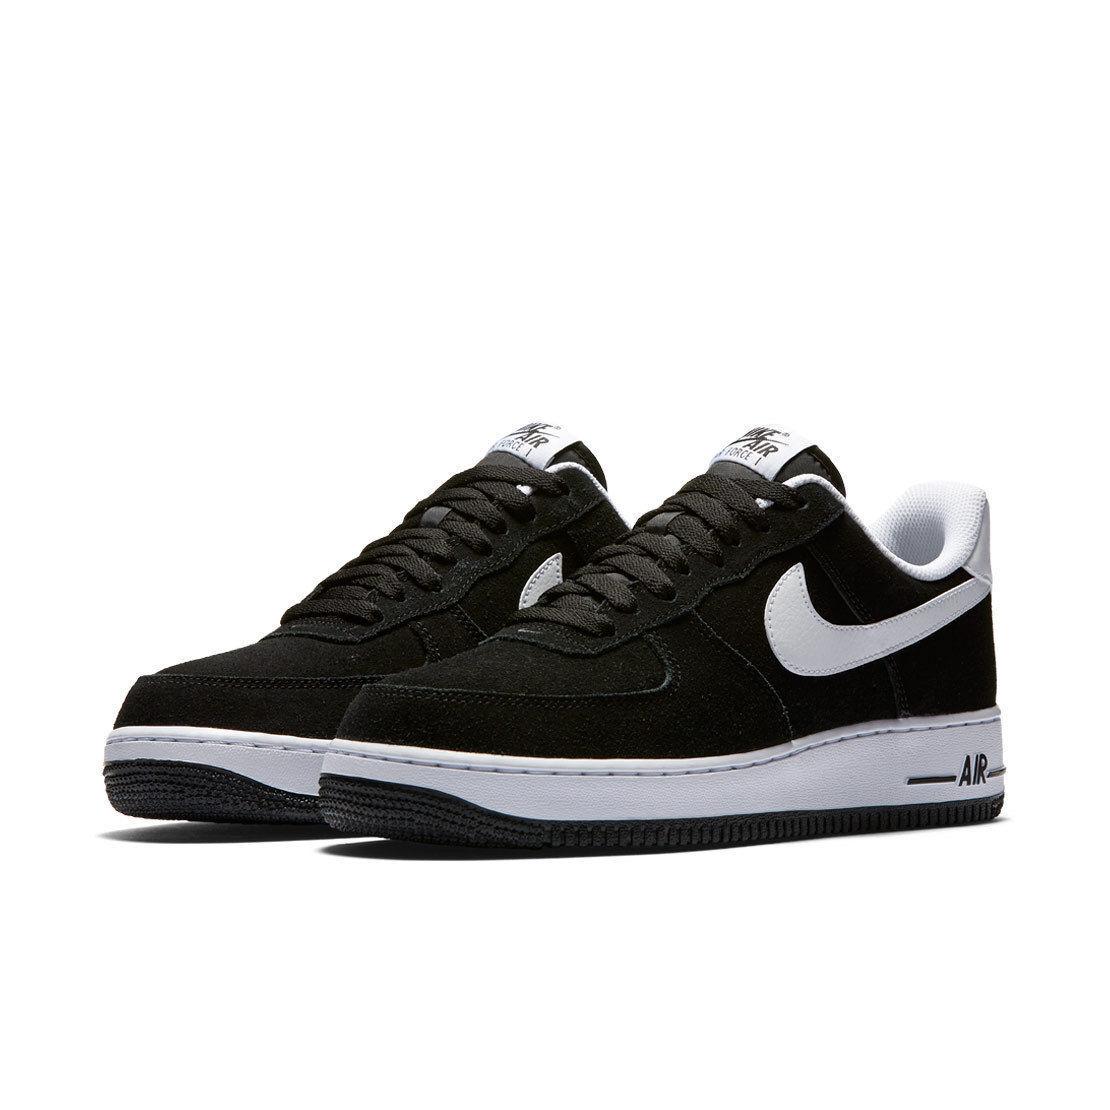 Nike - Nike Air Force 1 Low Men's Shoes (Size 6 - 15) Black / White 315122-068